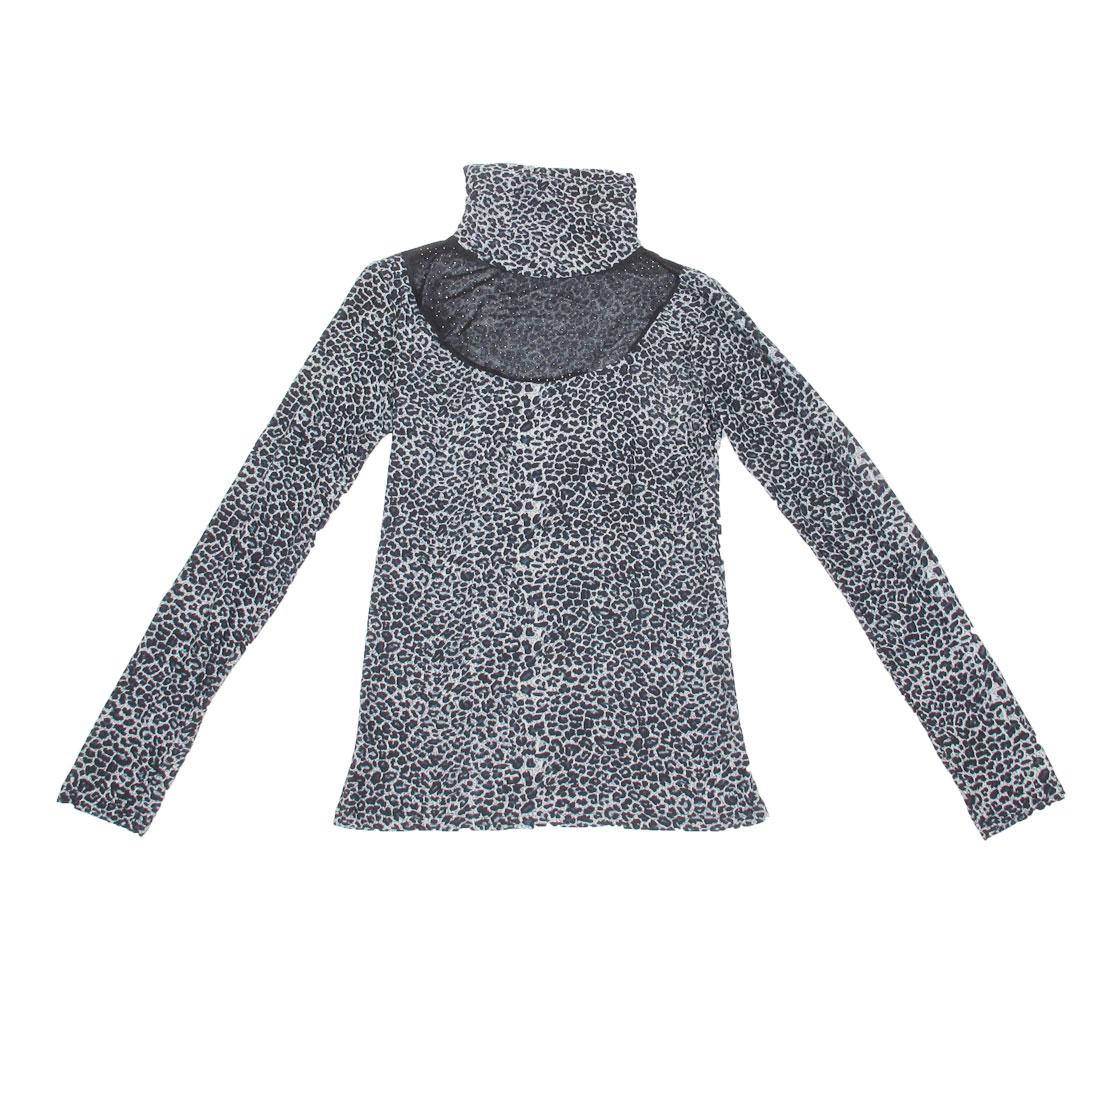 Ladies Dark Blue Ruffled Collar Rivet Detail Leopard Pattern Stretchy Shirt Tops XS